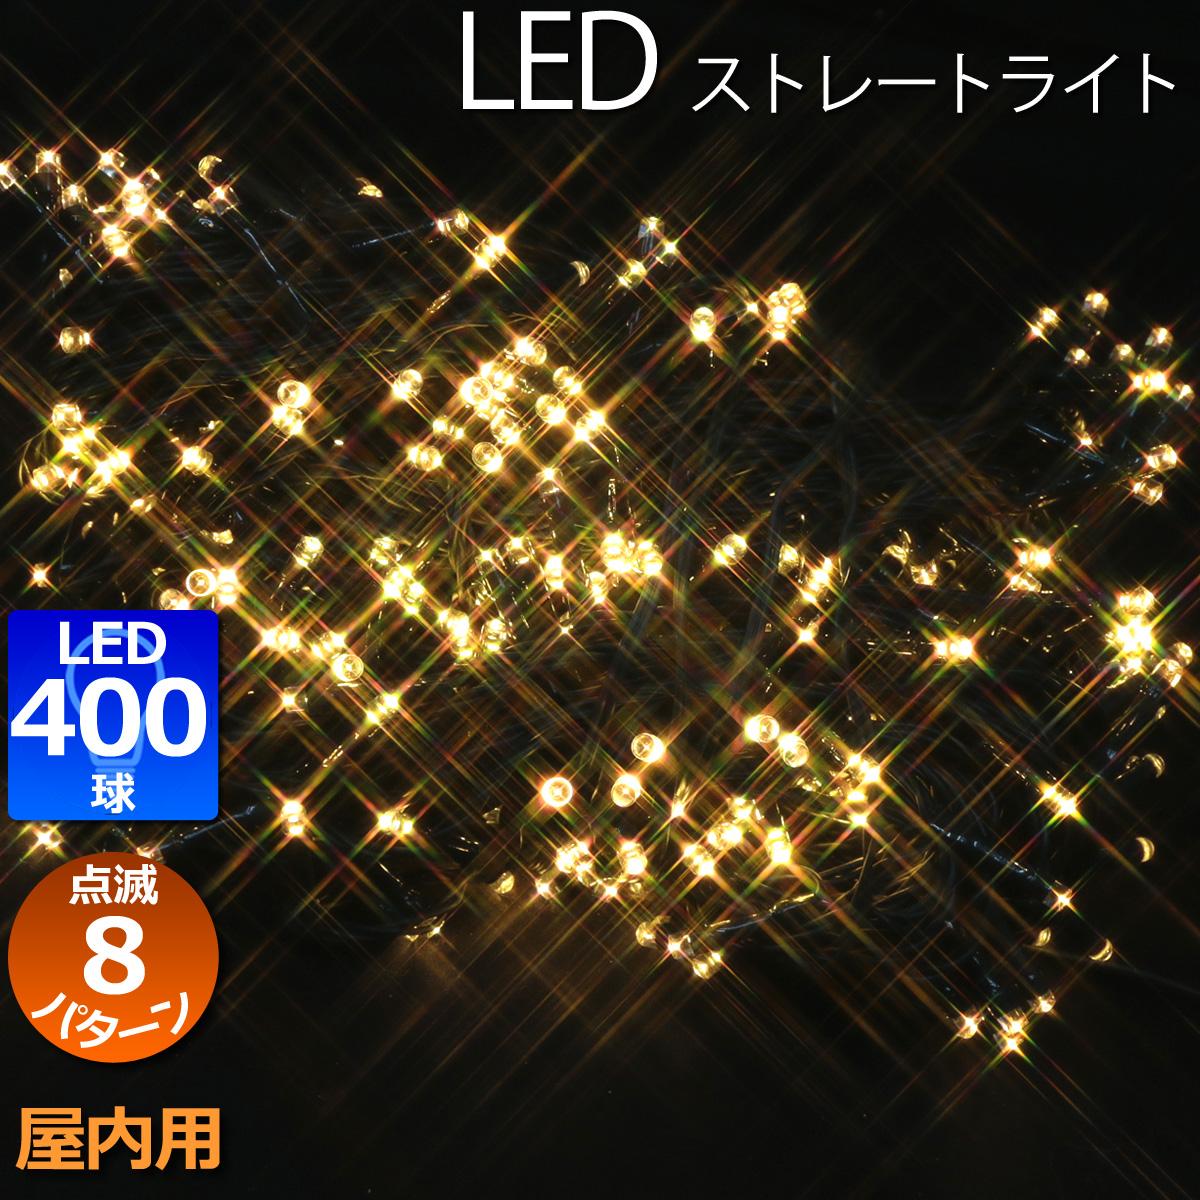 LED ストレートライト 400球 AC電源 防滴仕様 屋外可 LEDライト